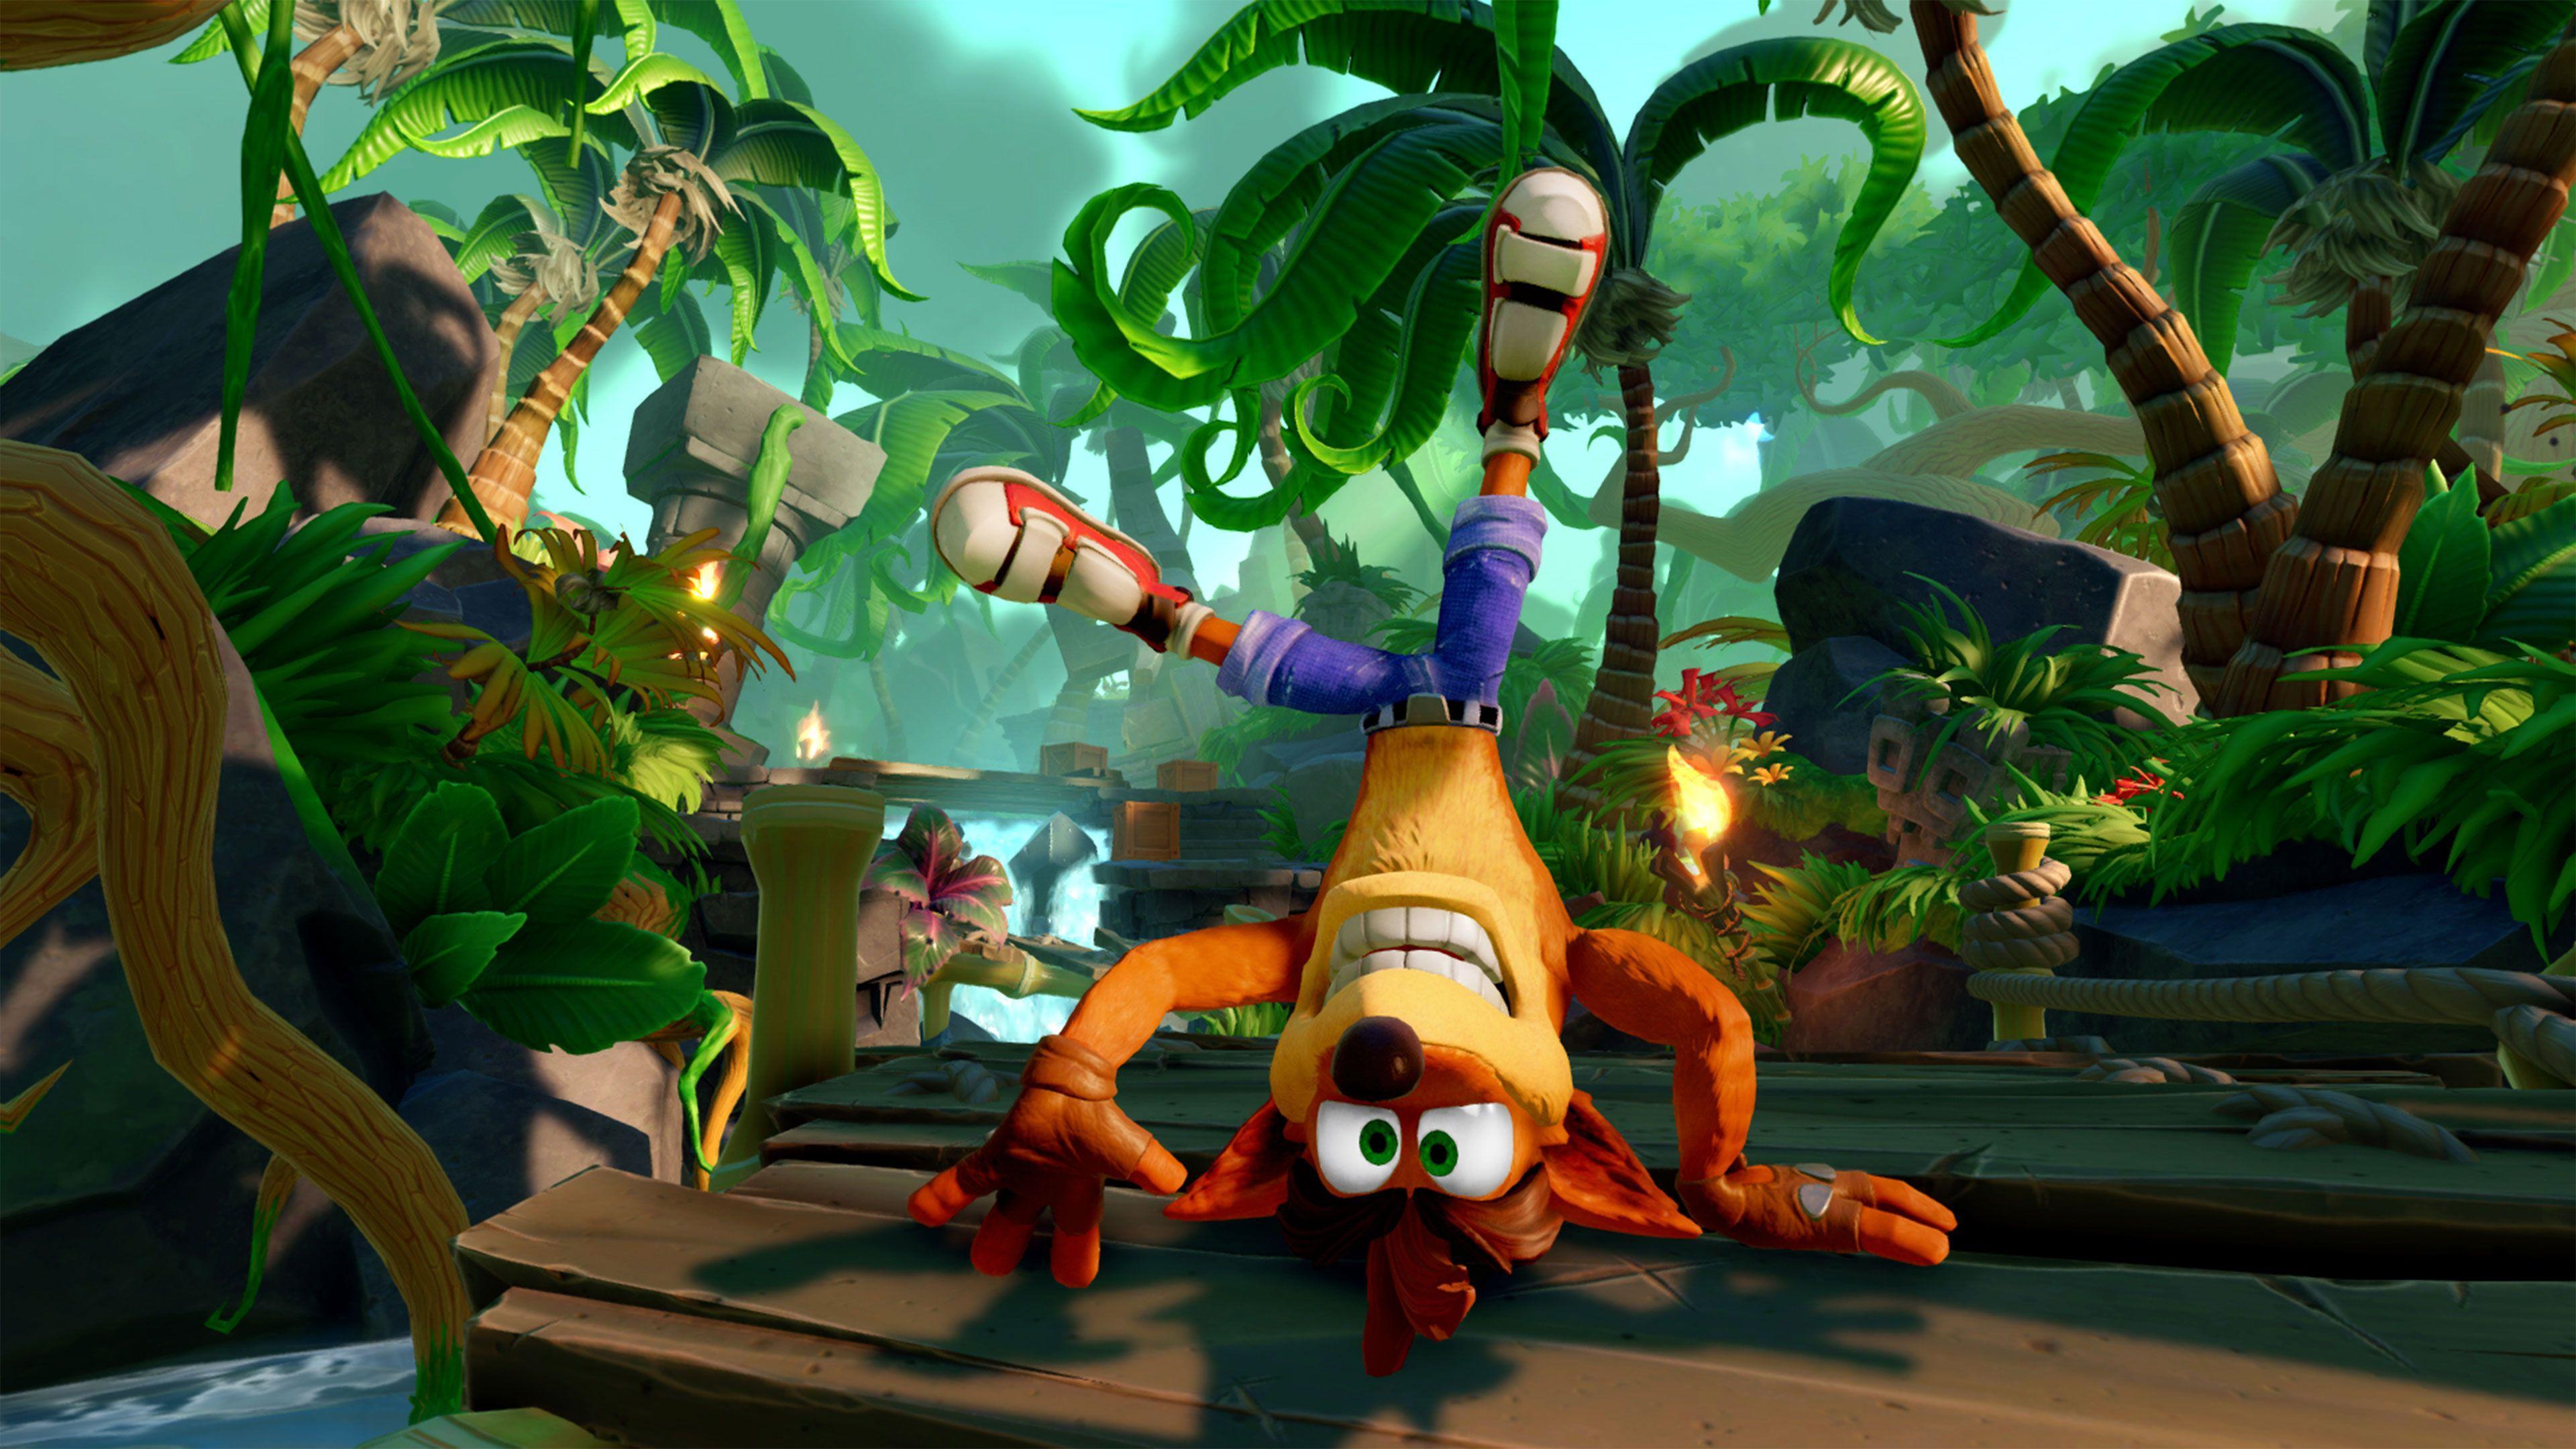 Crash Bandicoot Wallpapers Top Free Crash Bandicoot Backgrounds